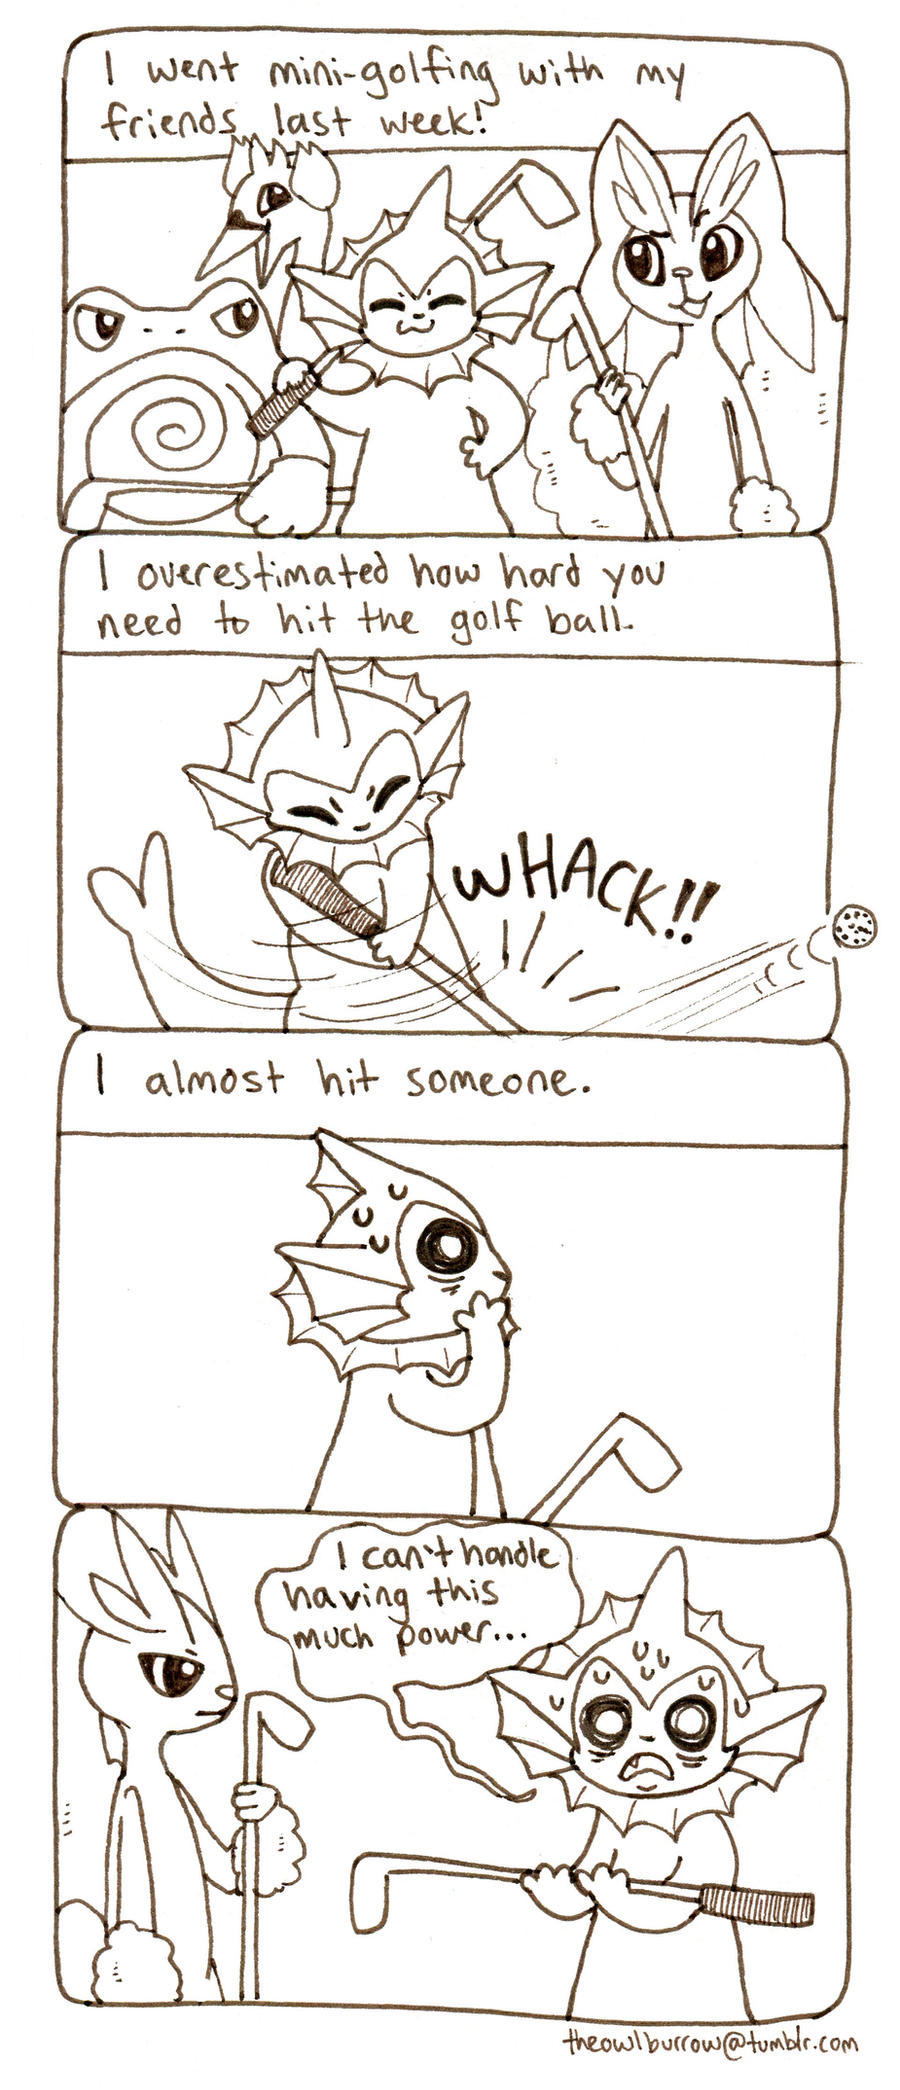 Mini Golf by owlburrow